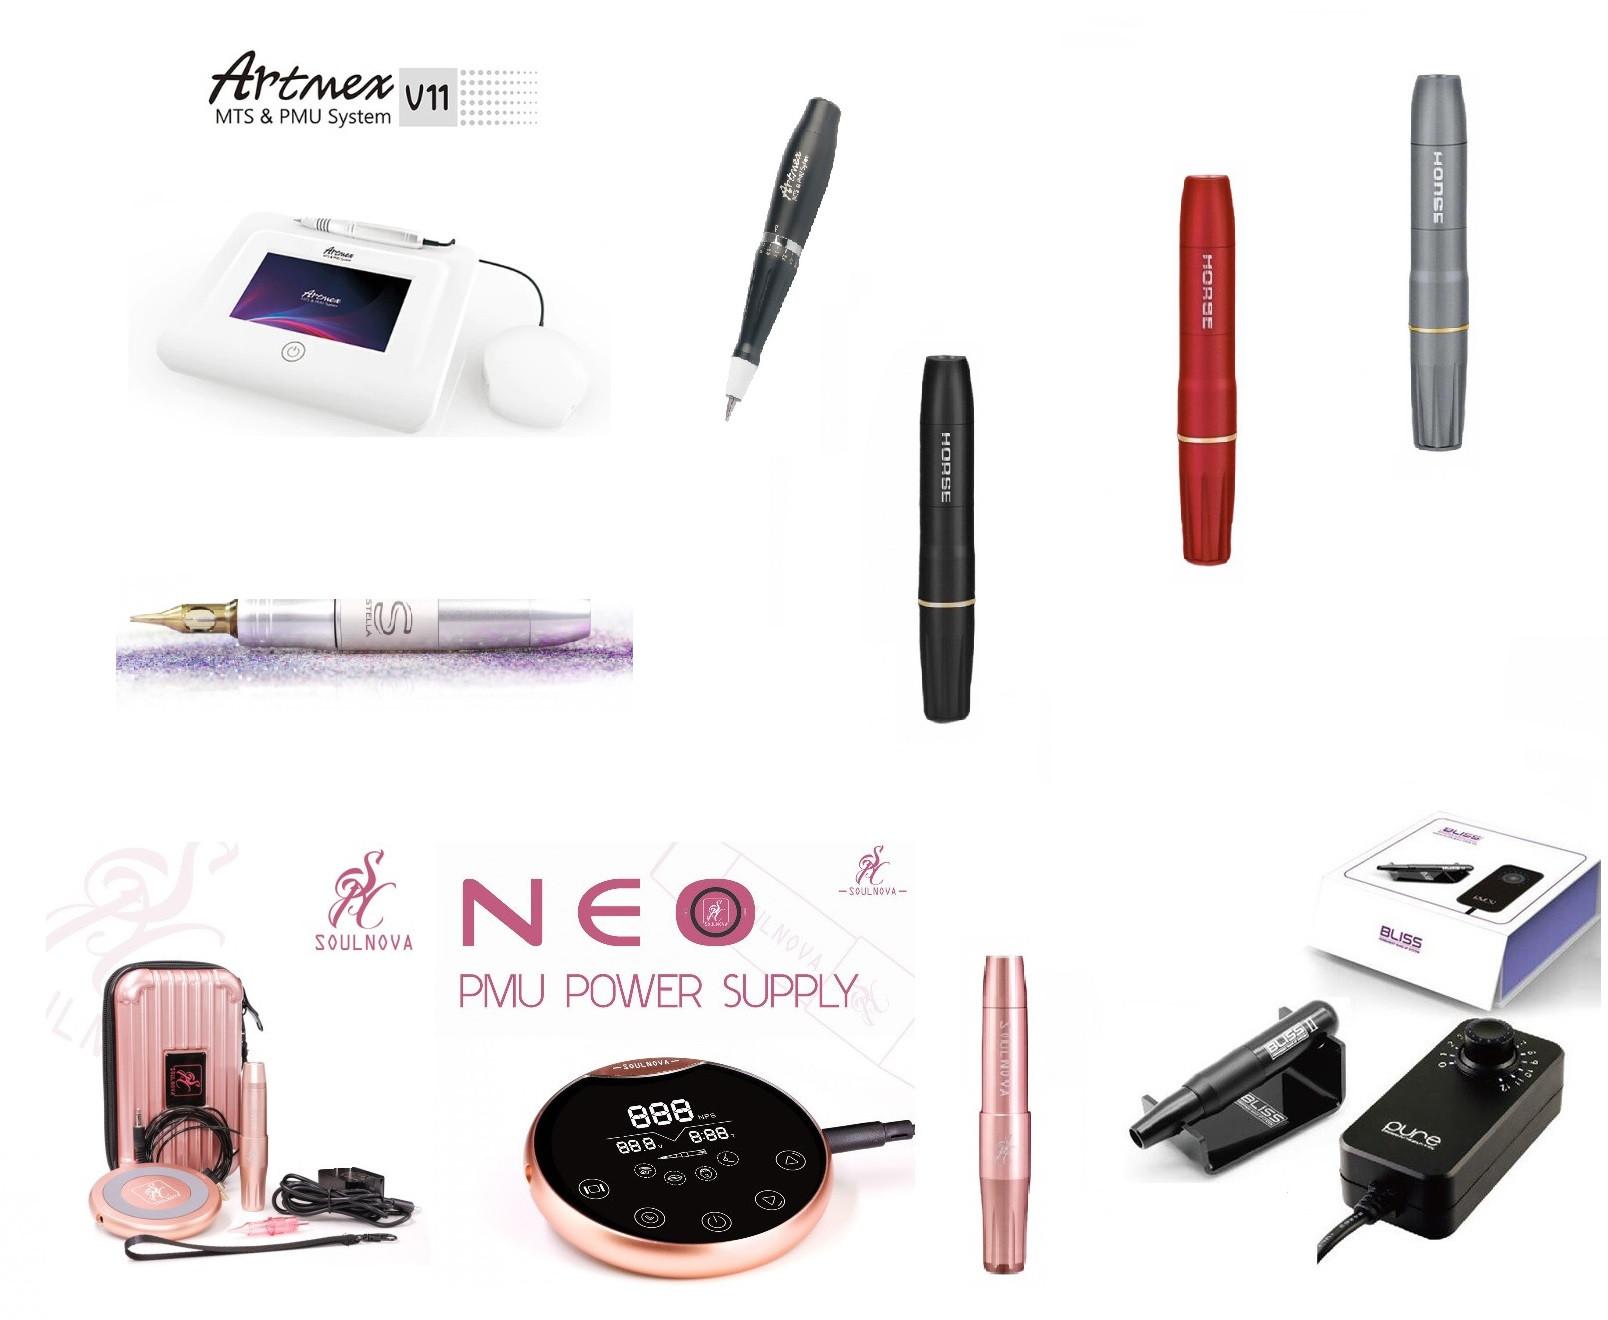 Dermografi Per Makeup